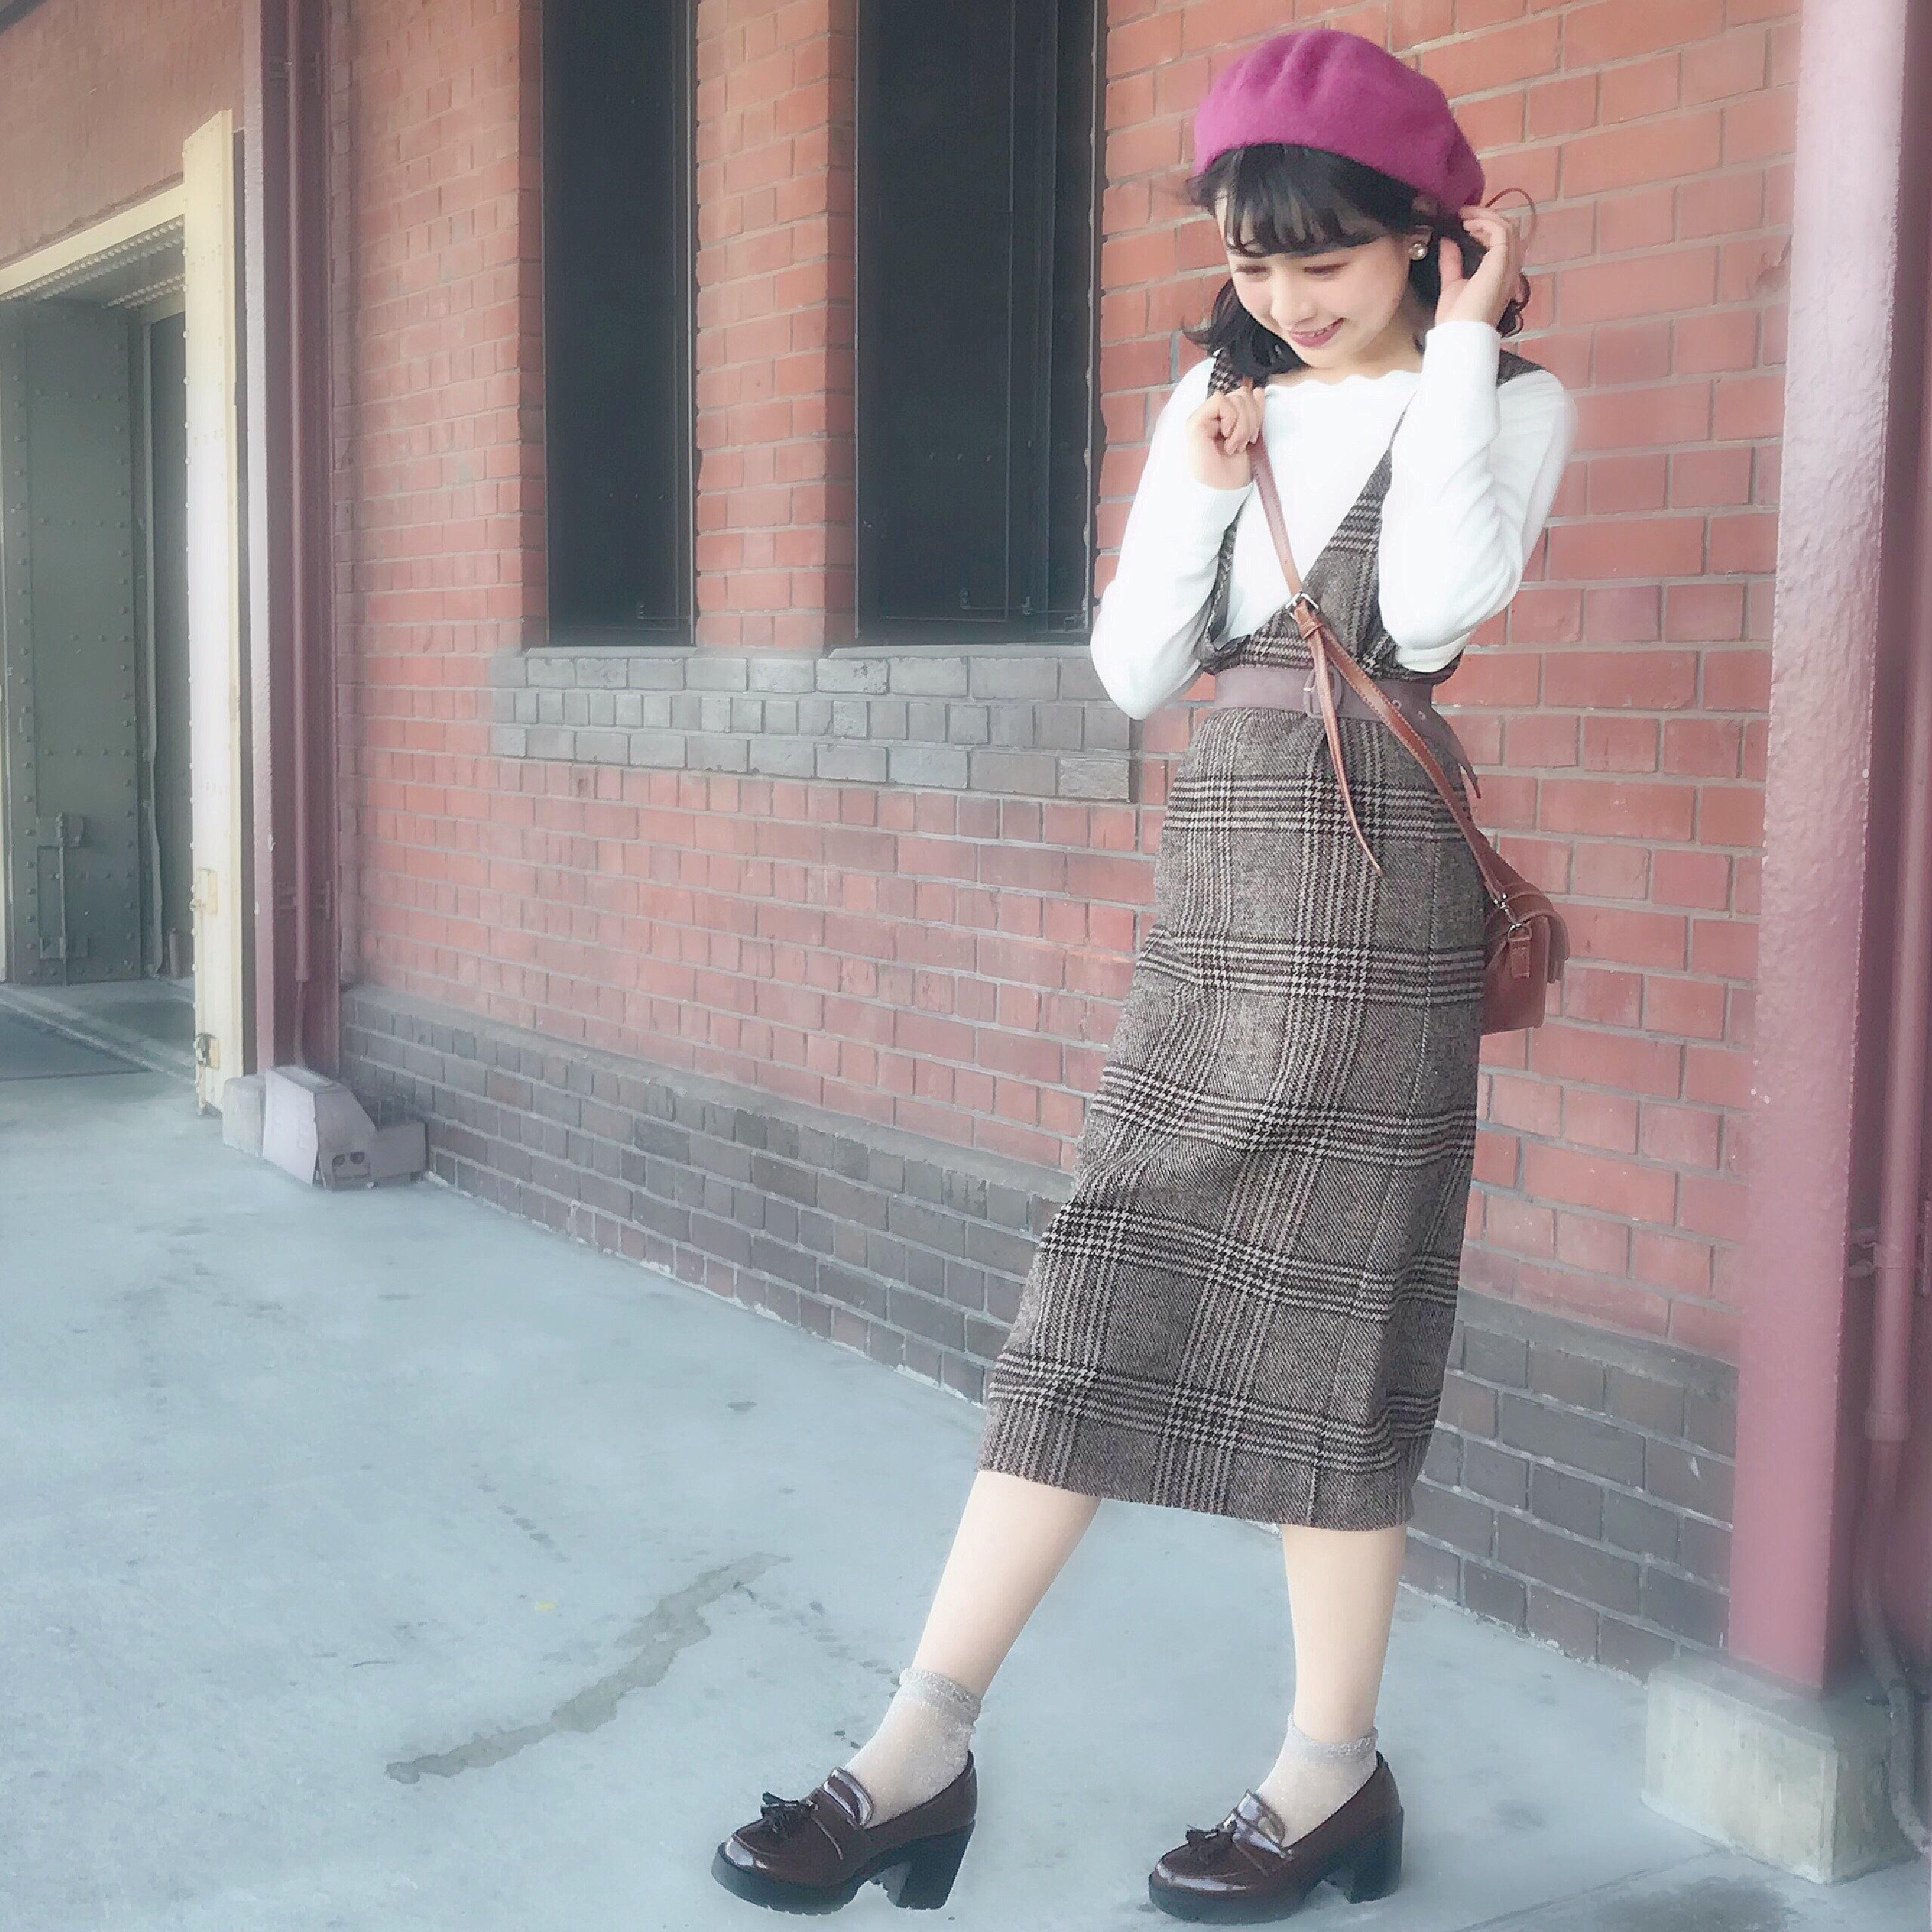 ☃︎秋冬の定番アイテム♡ベレー帽のかぶり方紹介します☃︎_1_10